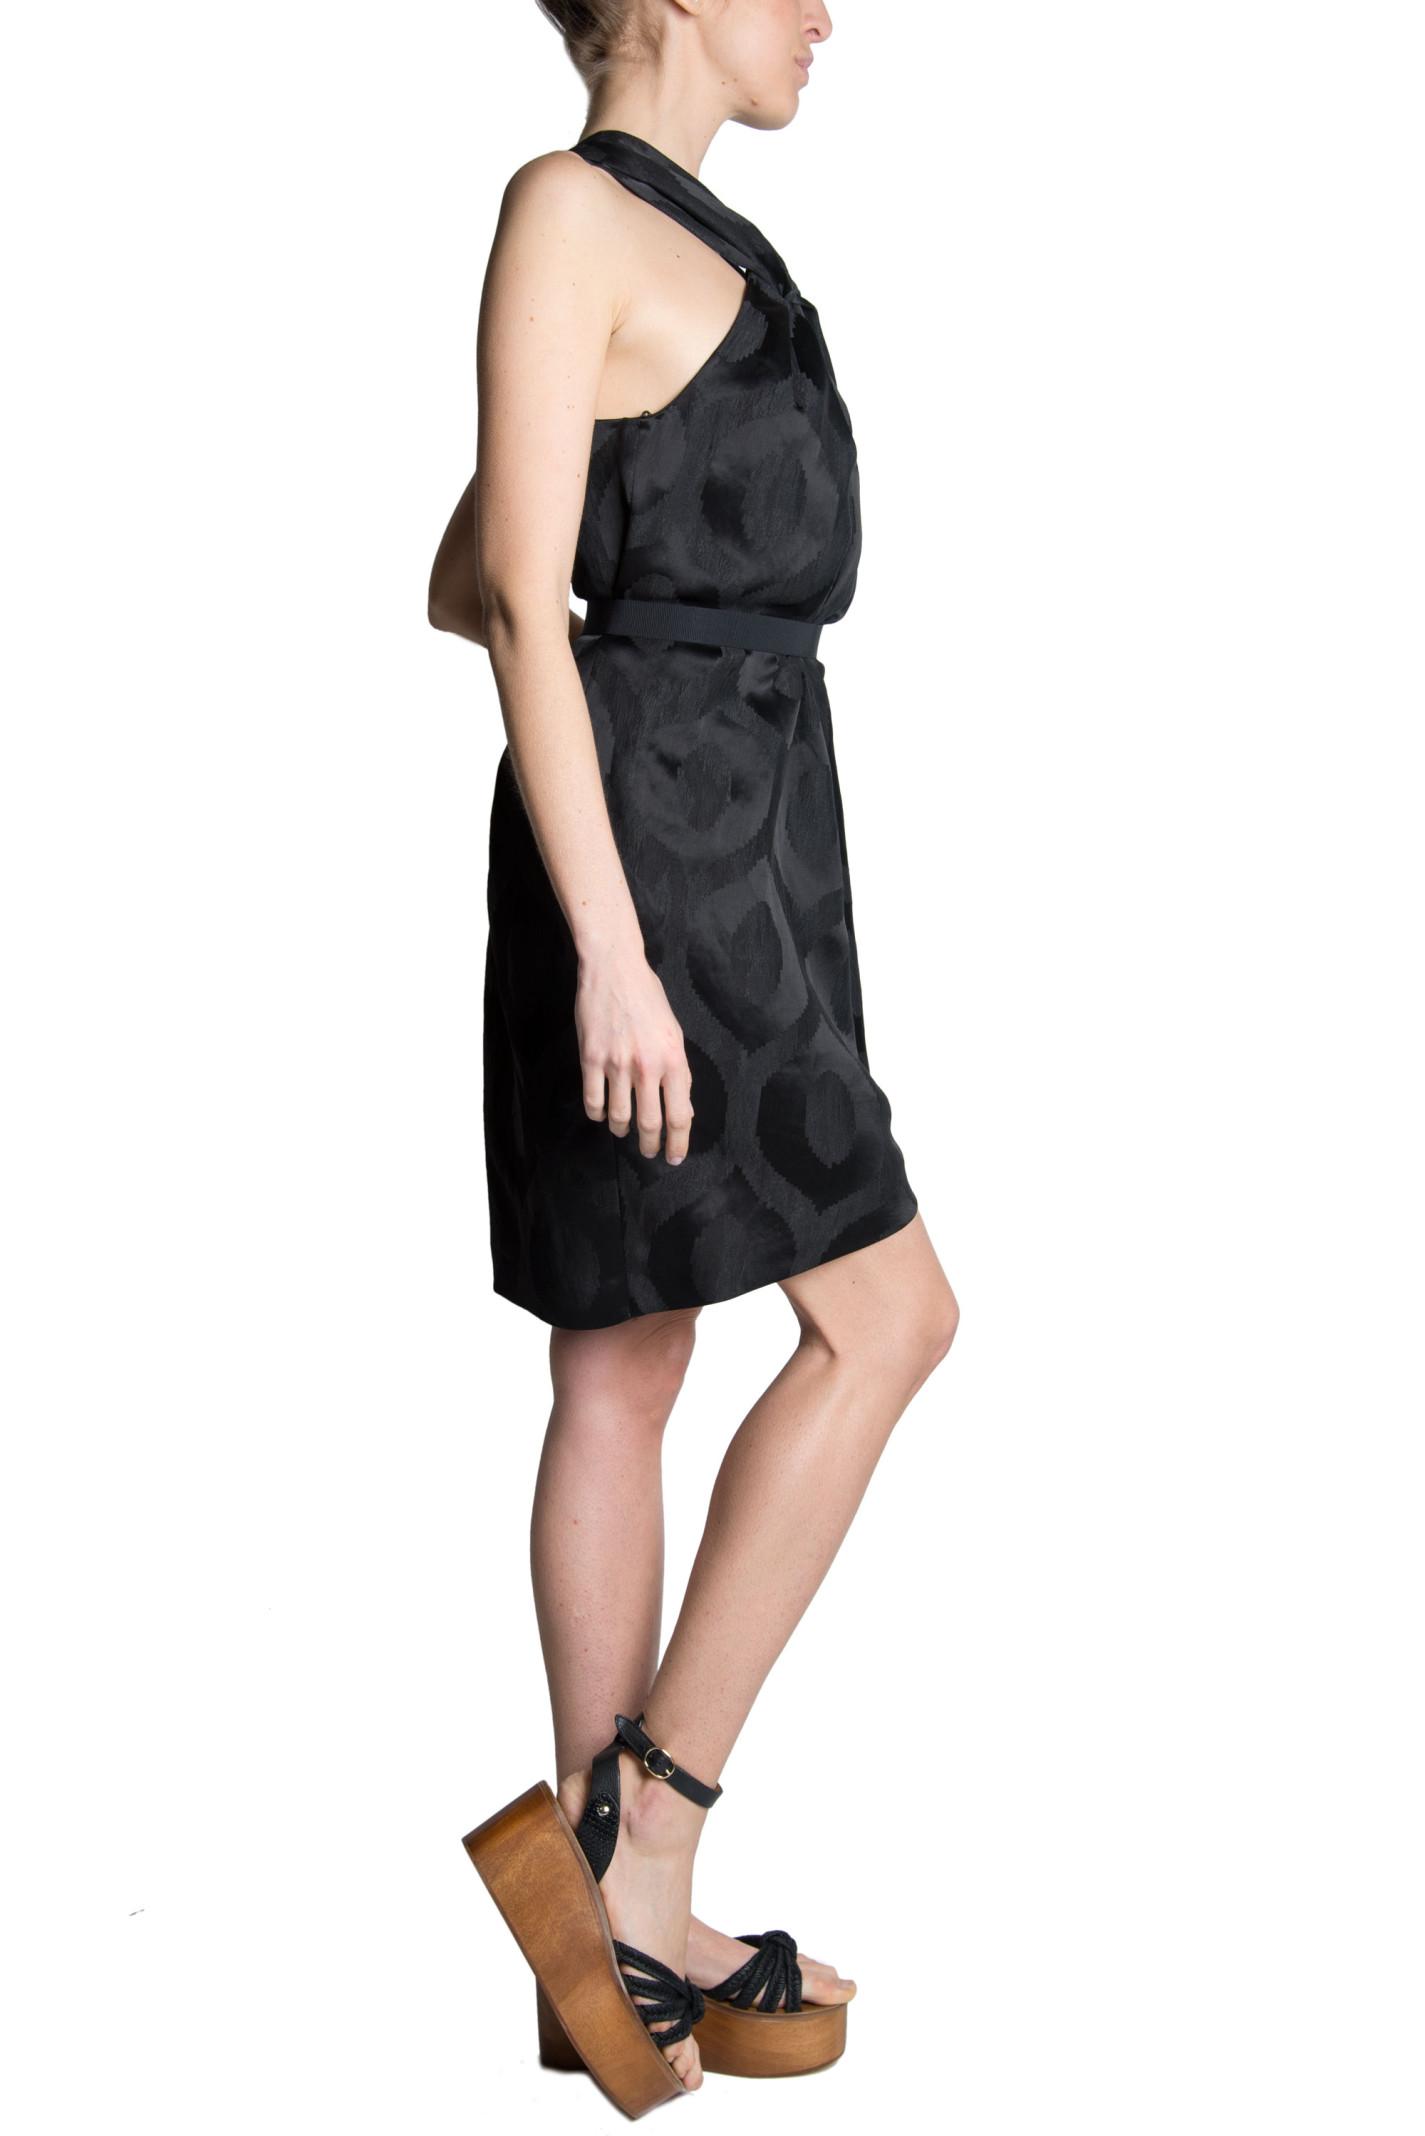 isabel marant isabel marant suzy jacquard dress black women 39 s dresses italist. Black Bedroom Furniture Sets. Home Design Ideas